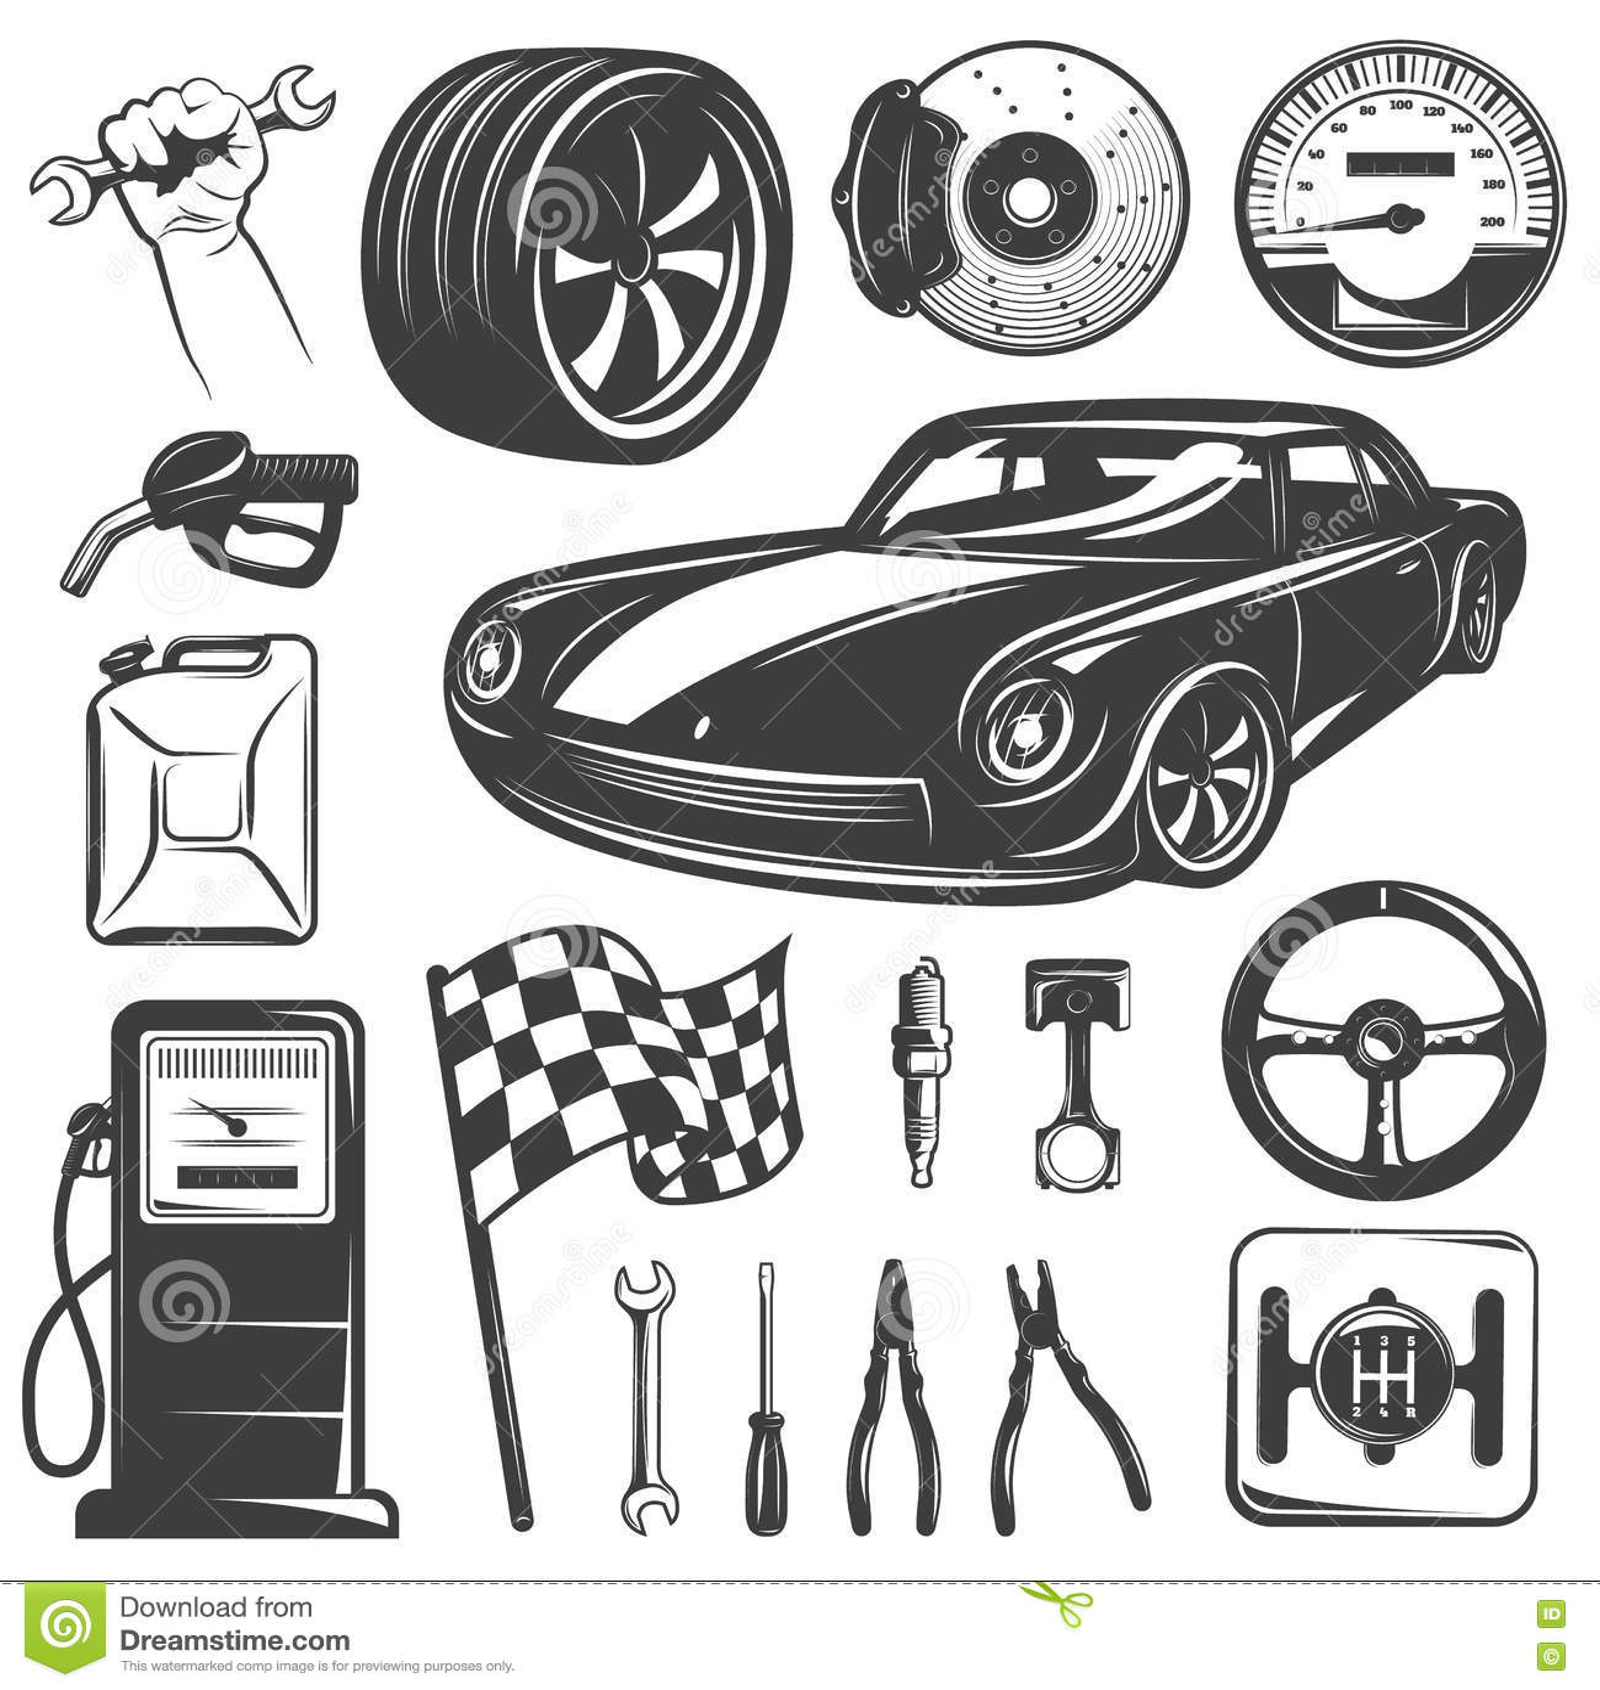 Car Repair Garage Icon Set stock vector. Illustration of engine ...